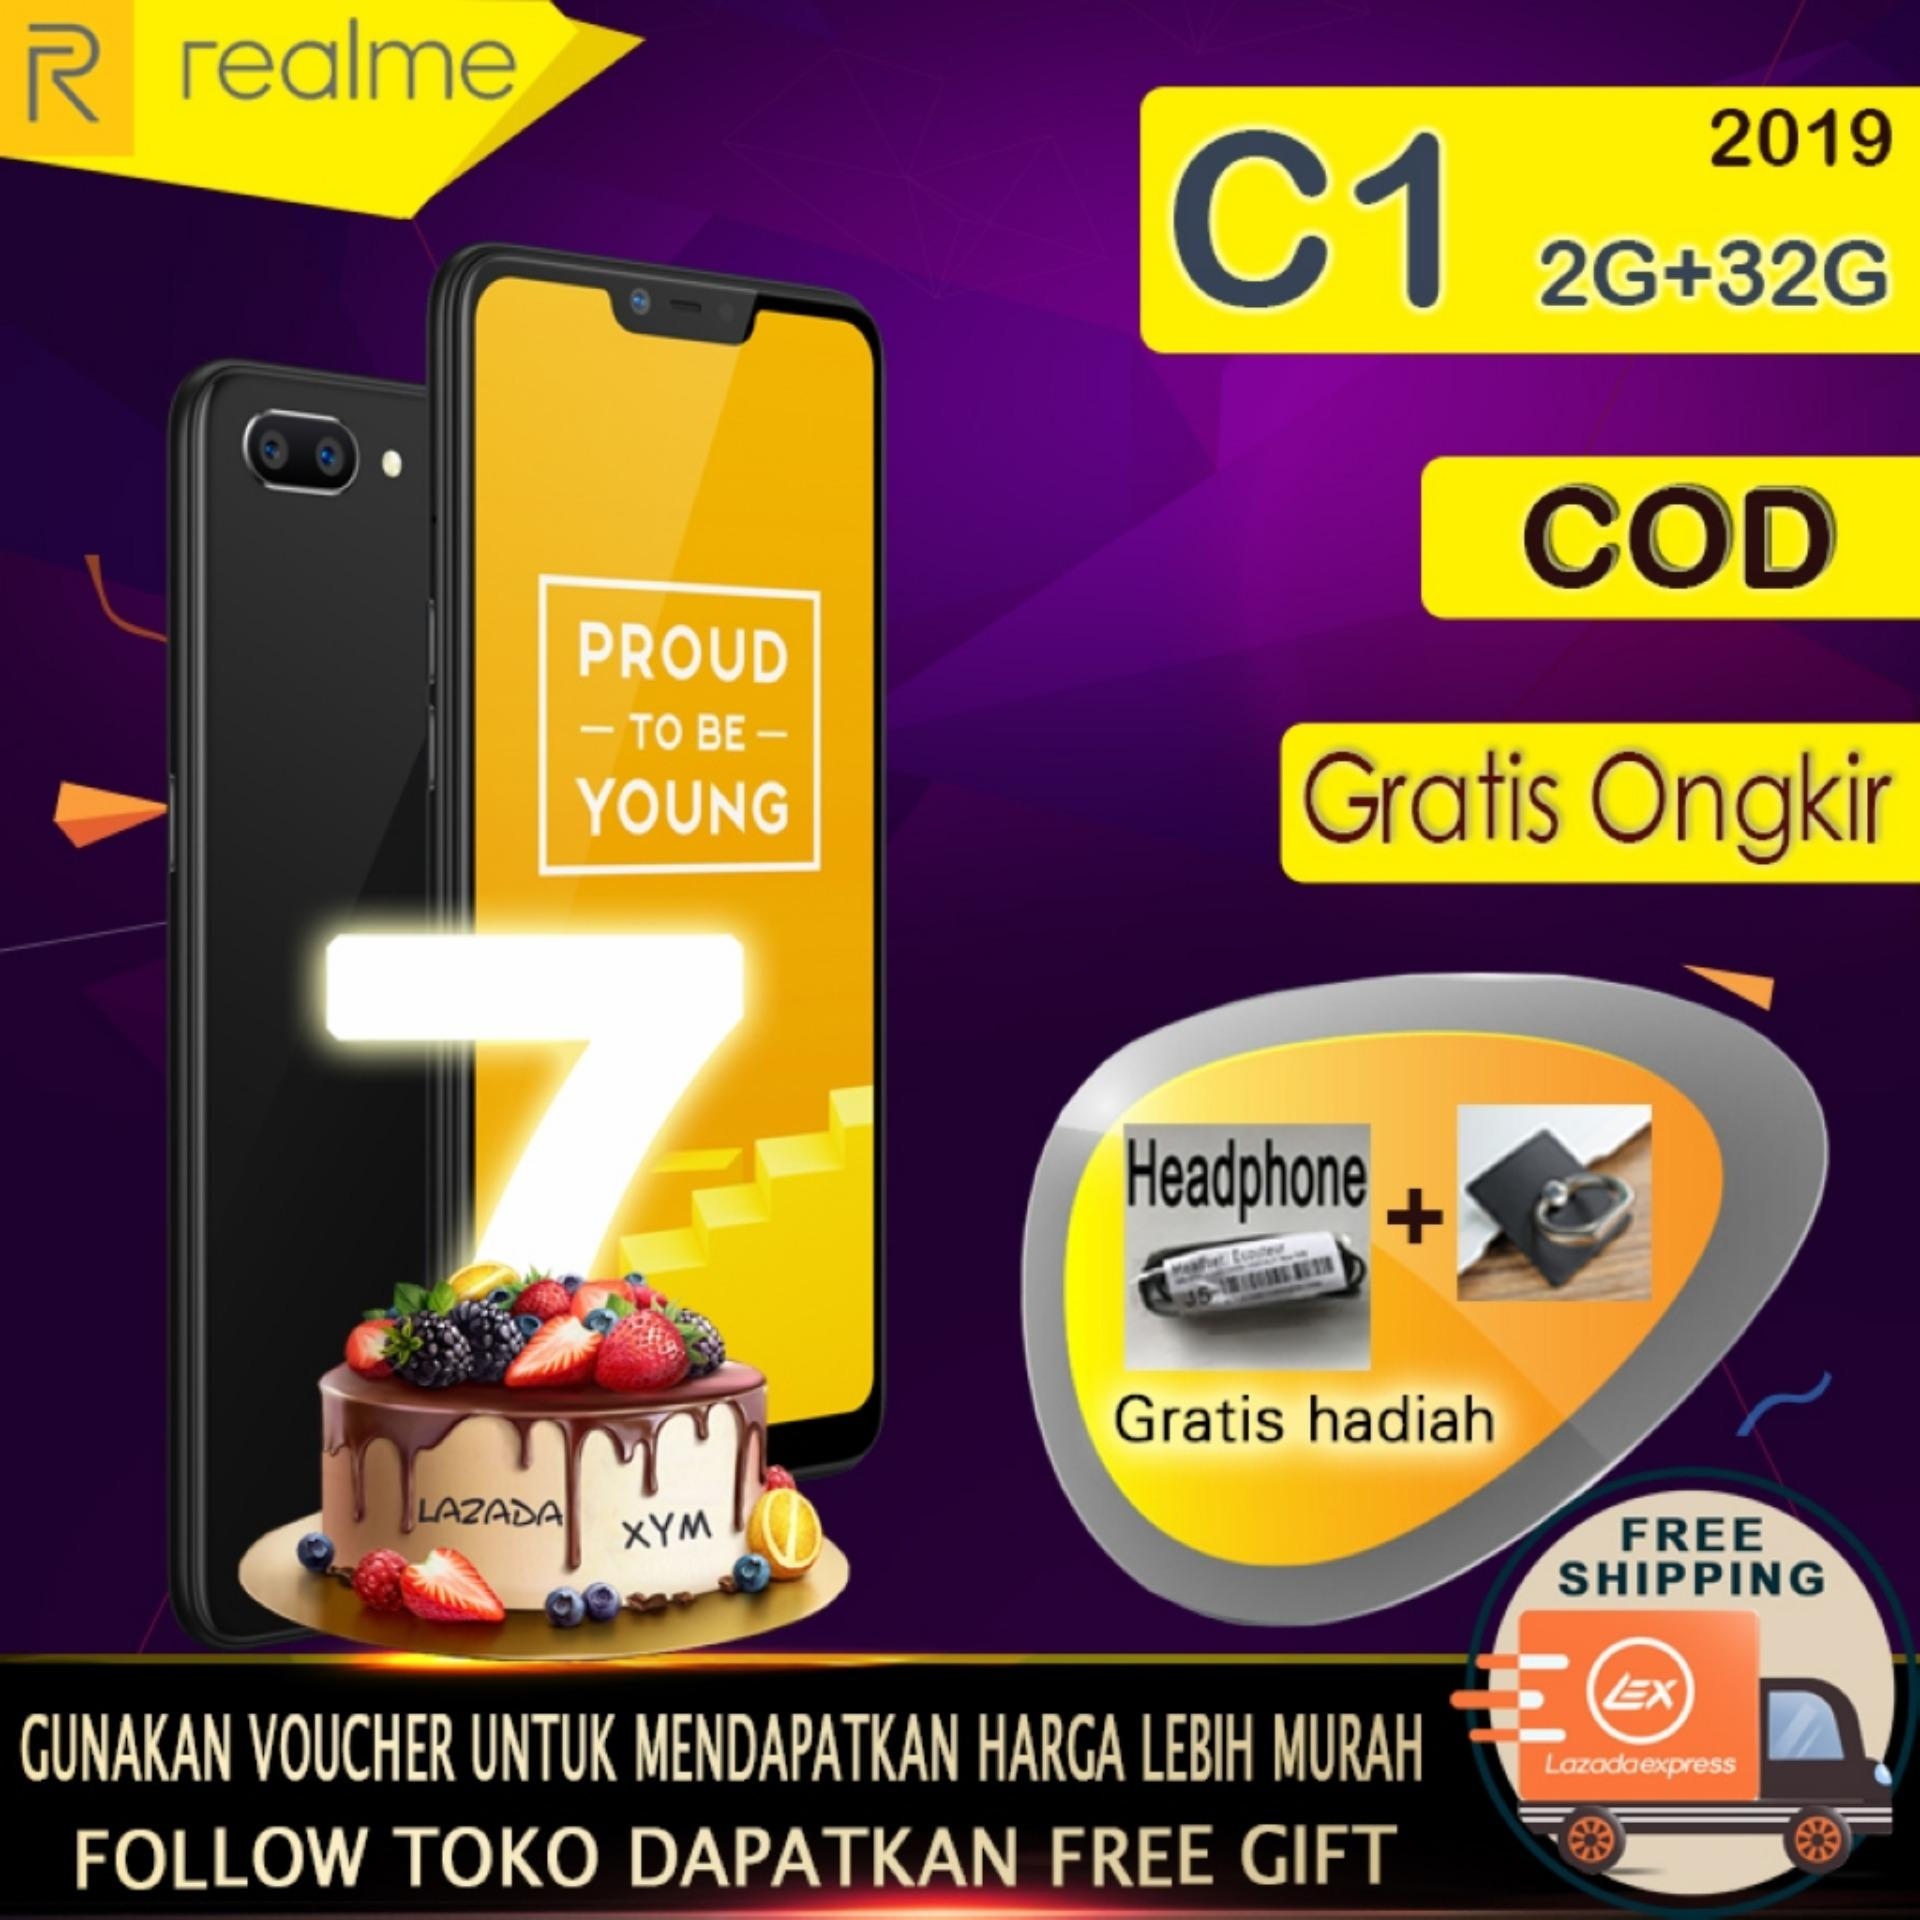 Realme C1 hp 2G+32G - COD, Gratis Ongkir, Baterai Besar 4230mAh, AI Facial Unlock, Garansi resmi [ Please use the voucher ]